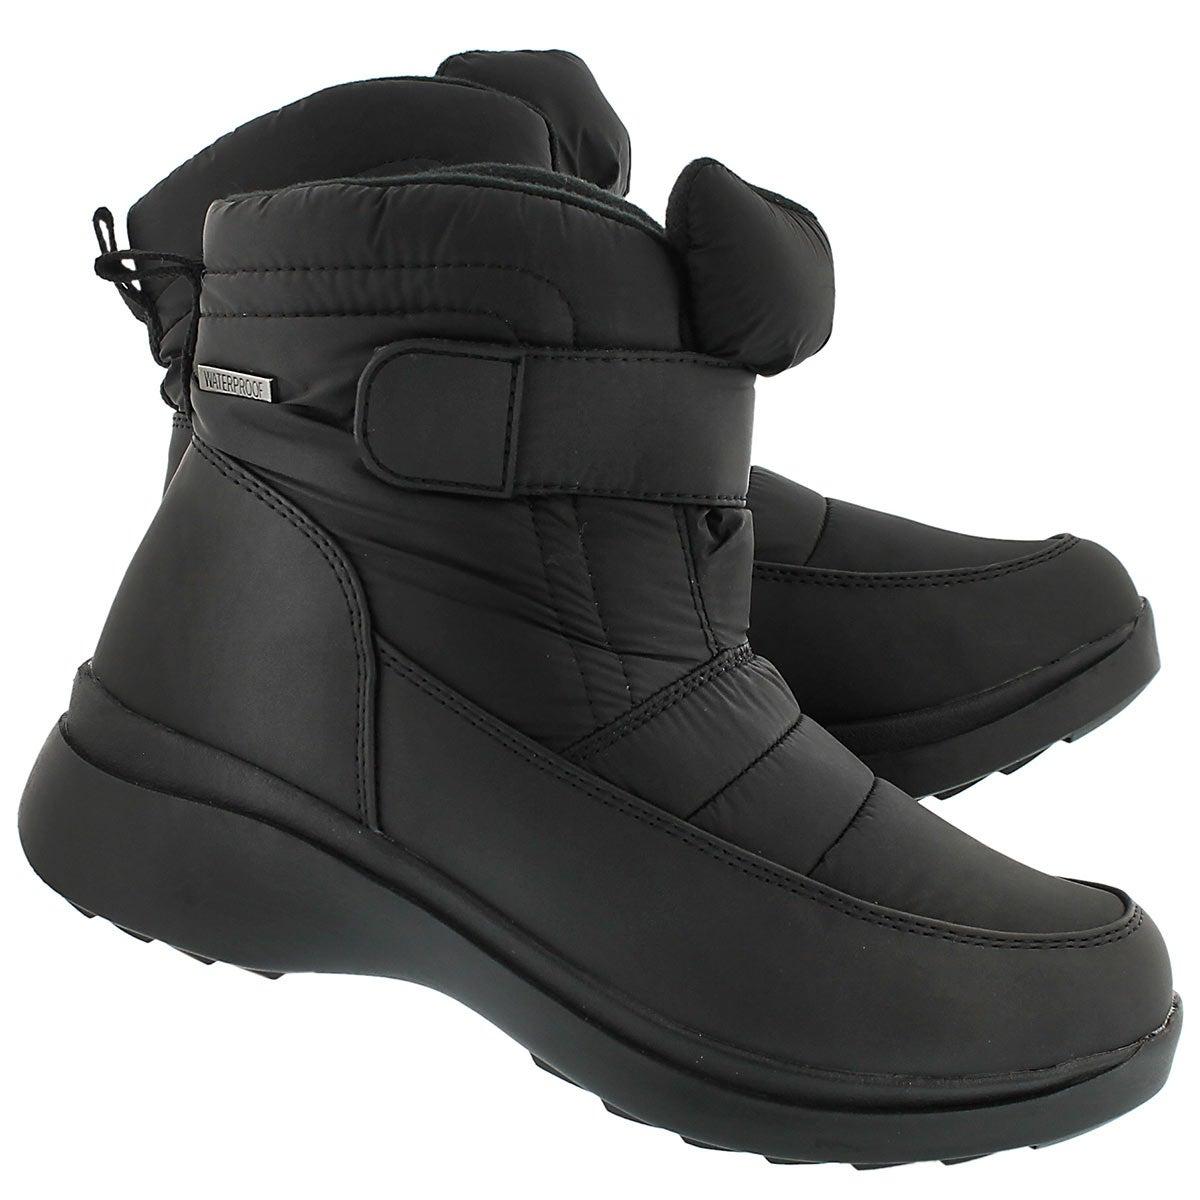 Lds Caprice black wtrpf lined boot